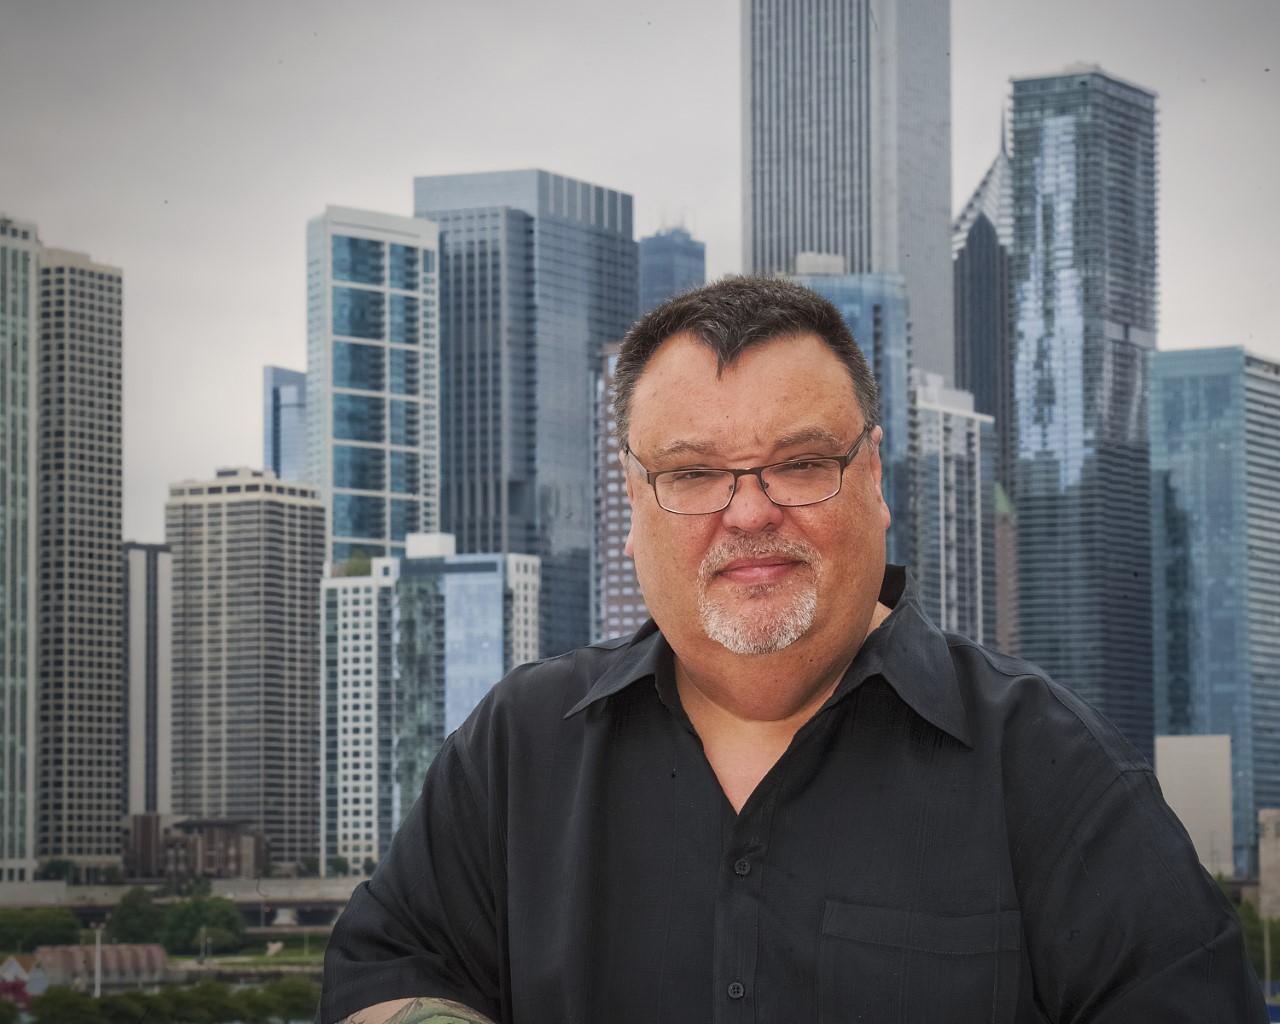 Jim Derogatis